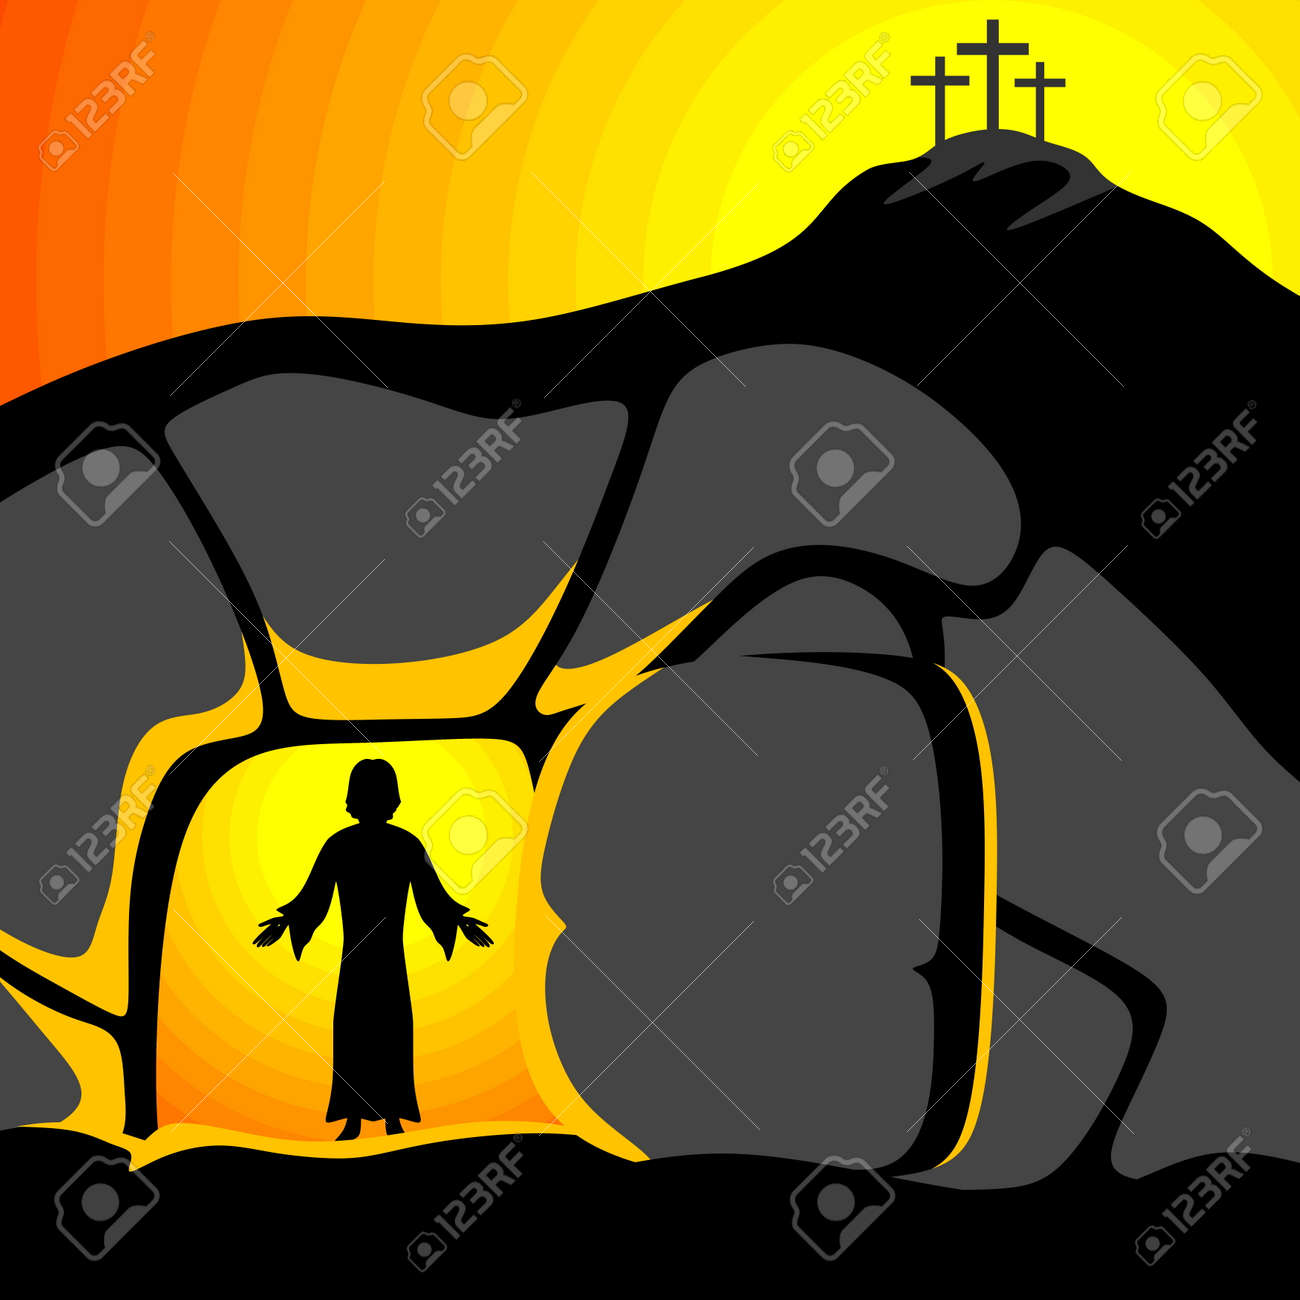 Easter illustration. Jesus Christ is risen. - 117556927